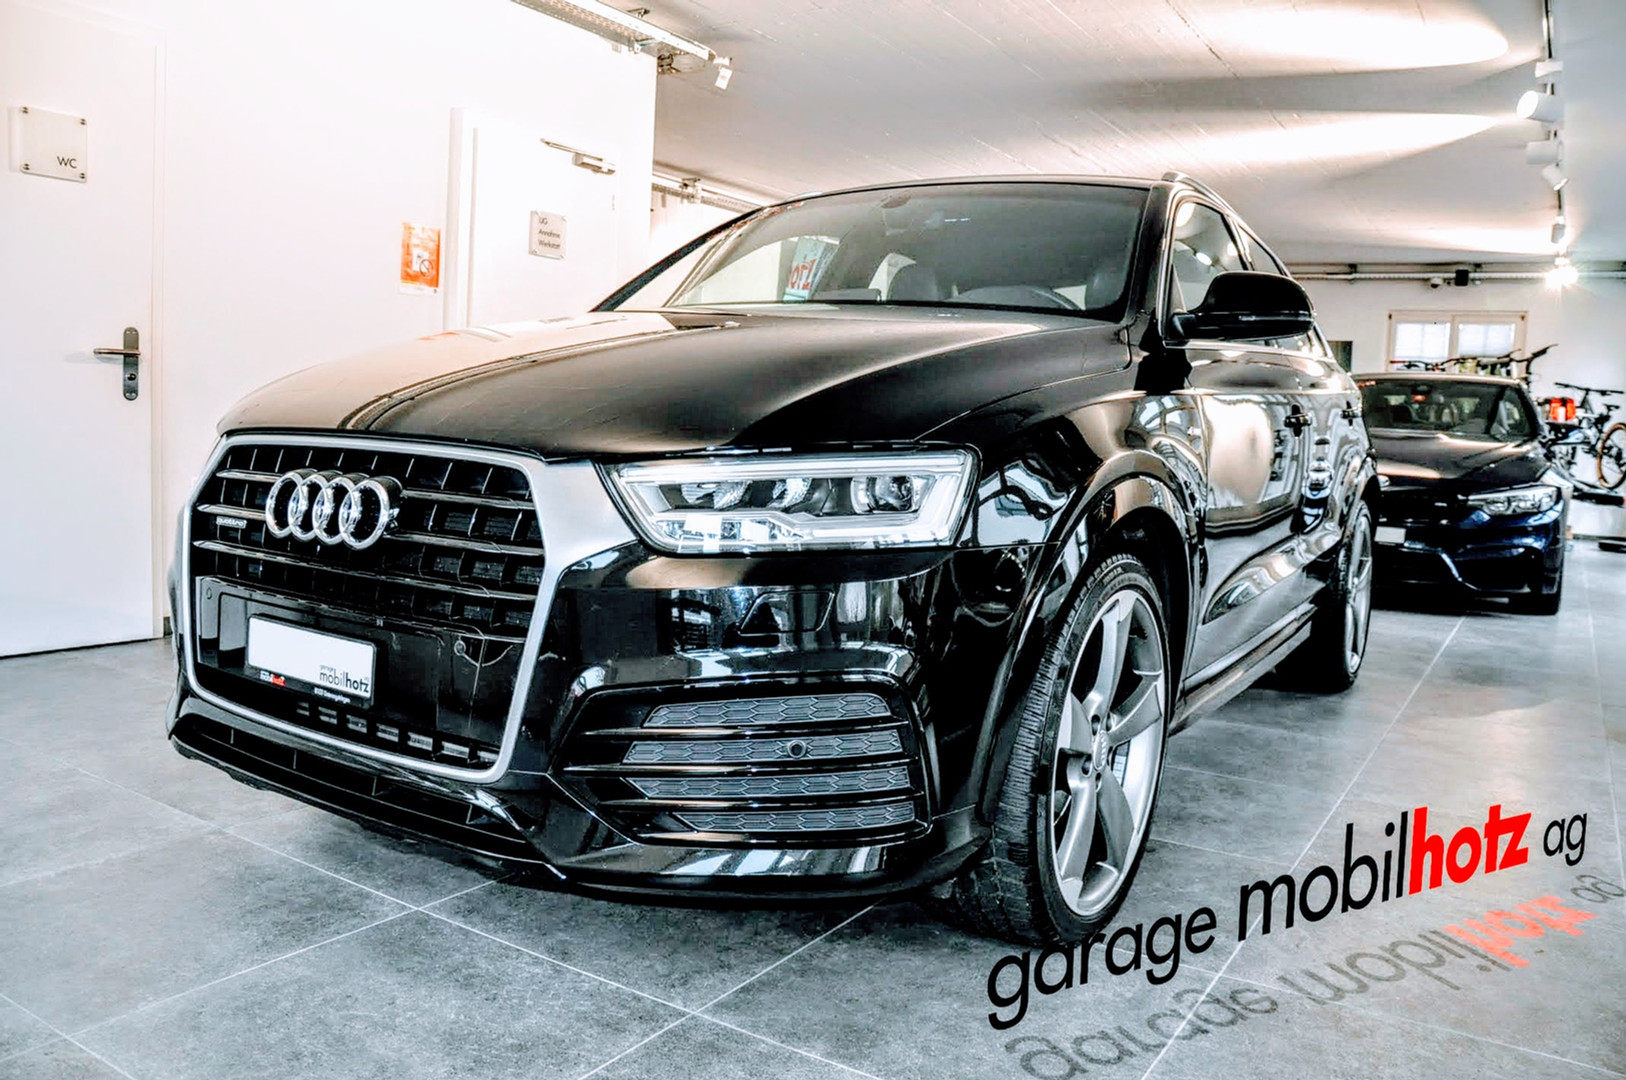 Kommissionsverkauf Audi Q3.jpg